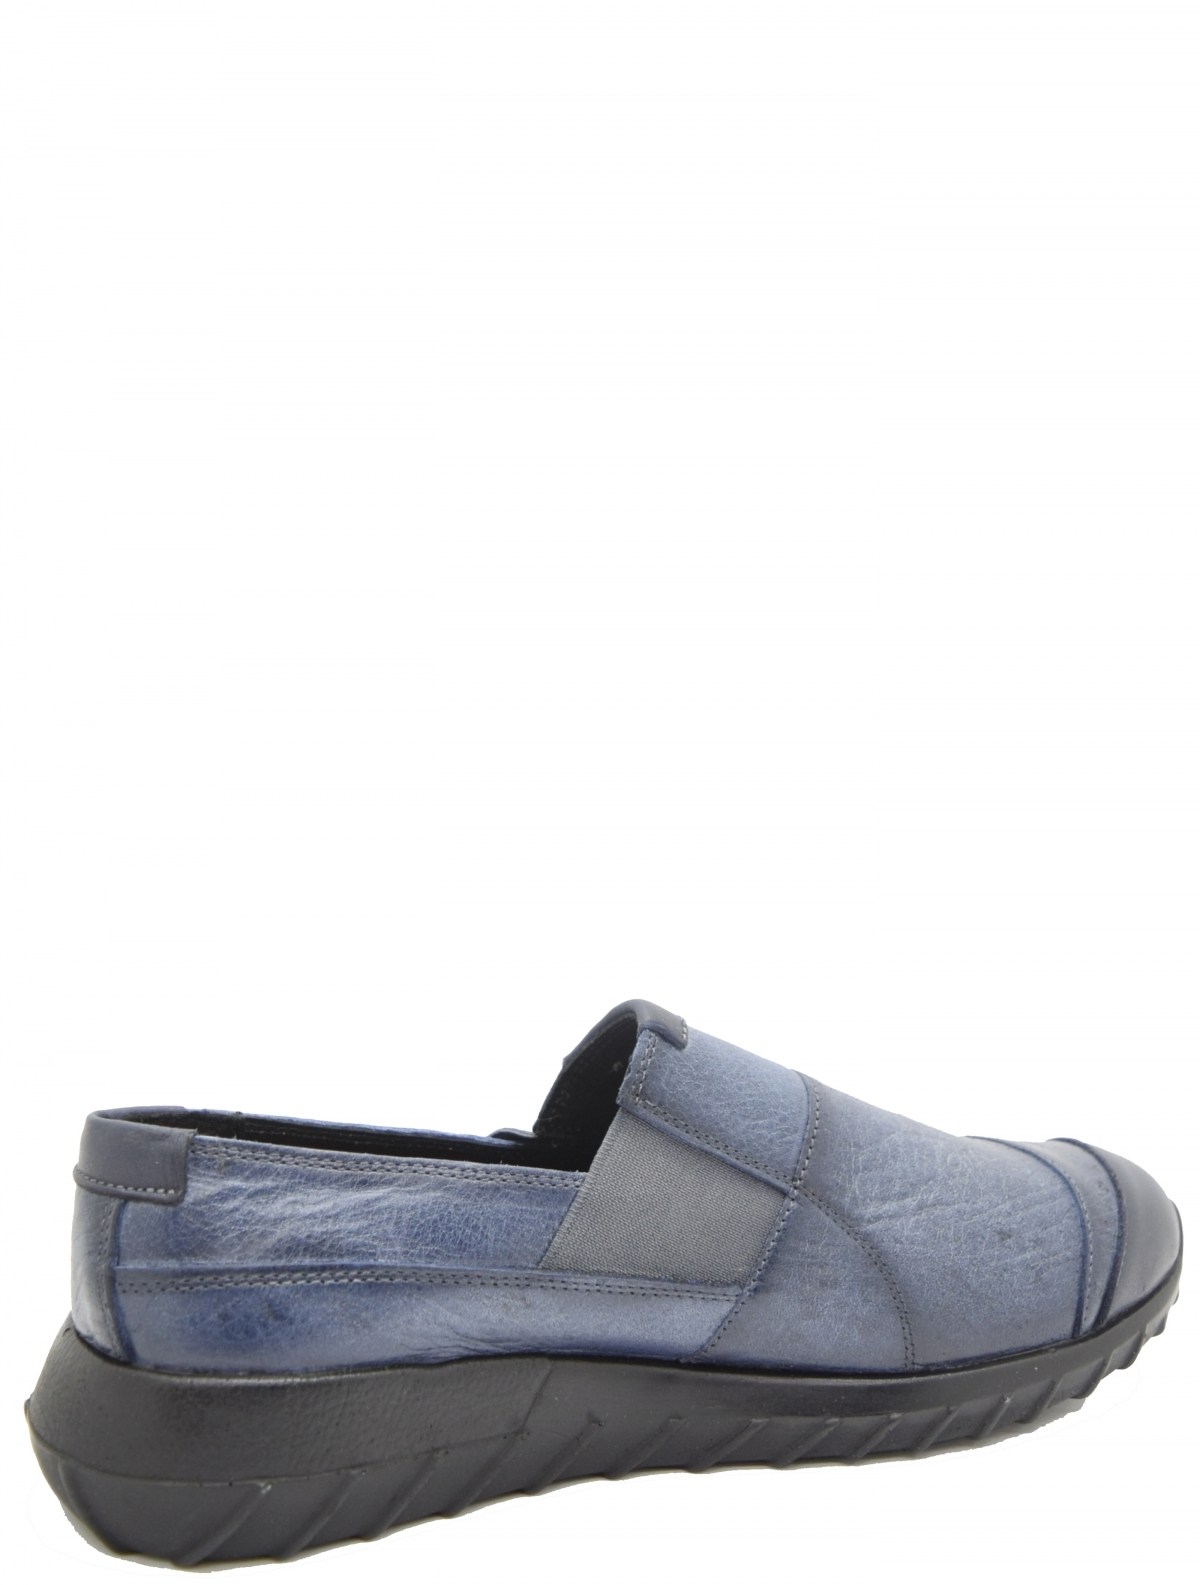 Rooman 510-158-N3C мужские туфли